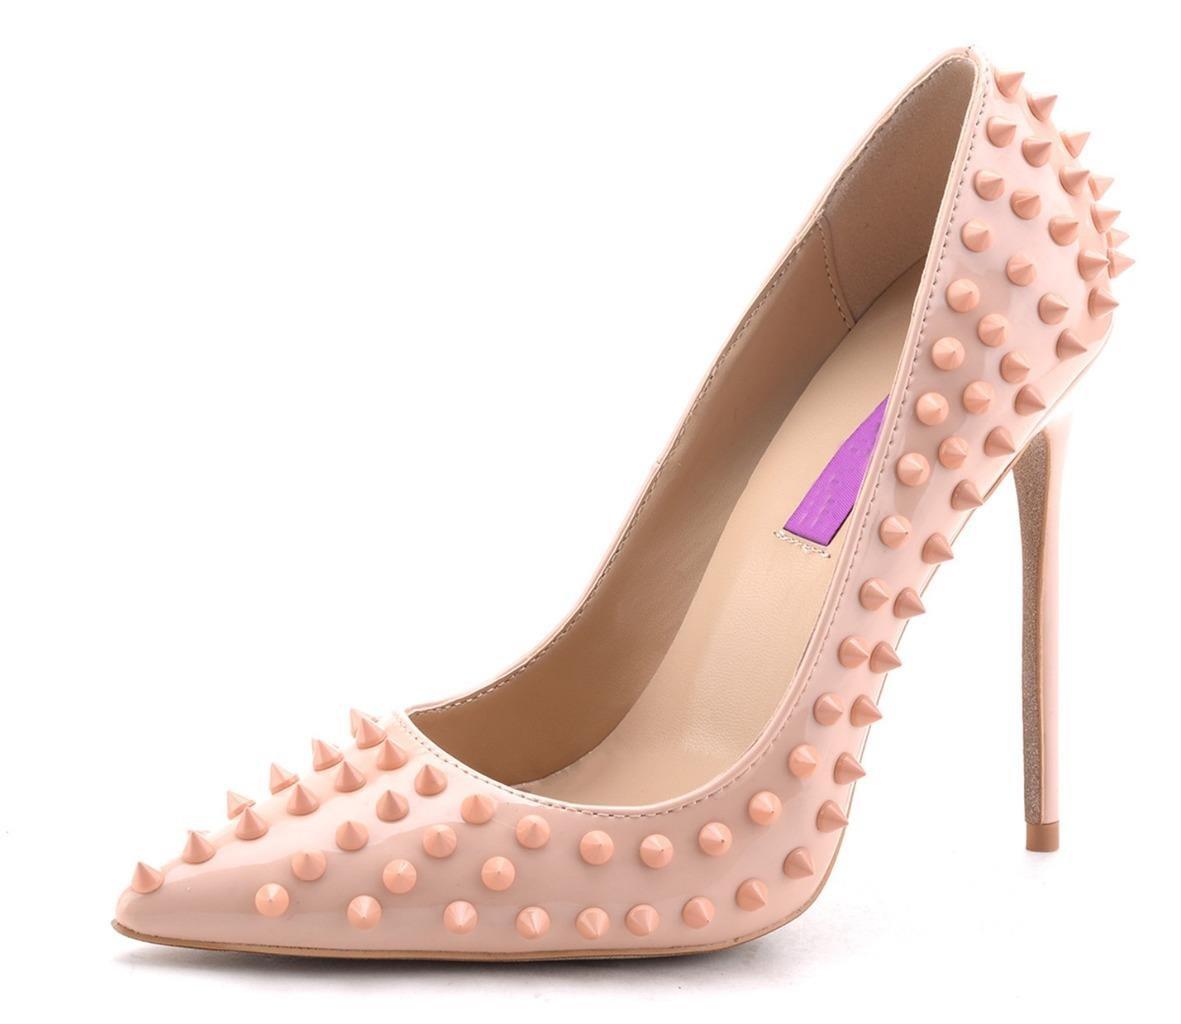 Jiu du Women's High Heel for Wedding Party Pumps Fashion Rivet Studded Stiletto Pointed Toe Dress Shoes B079185SMW US11/CN45/Foot long 27.5cm|Nude Pu